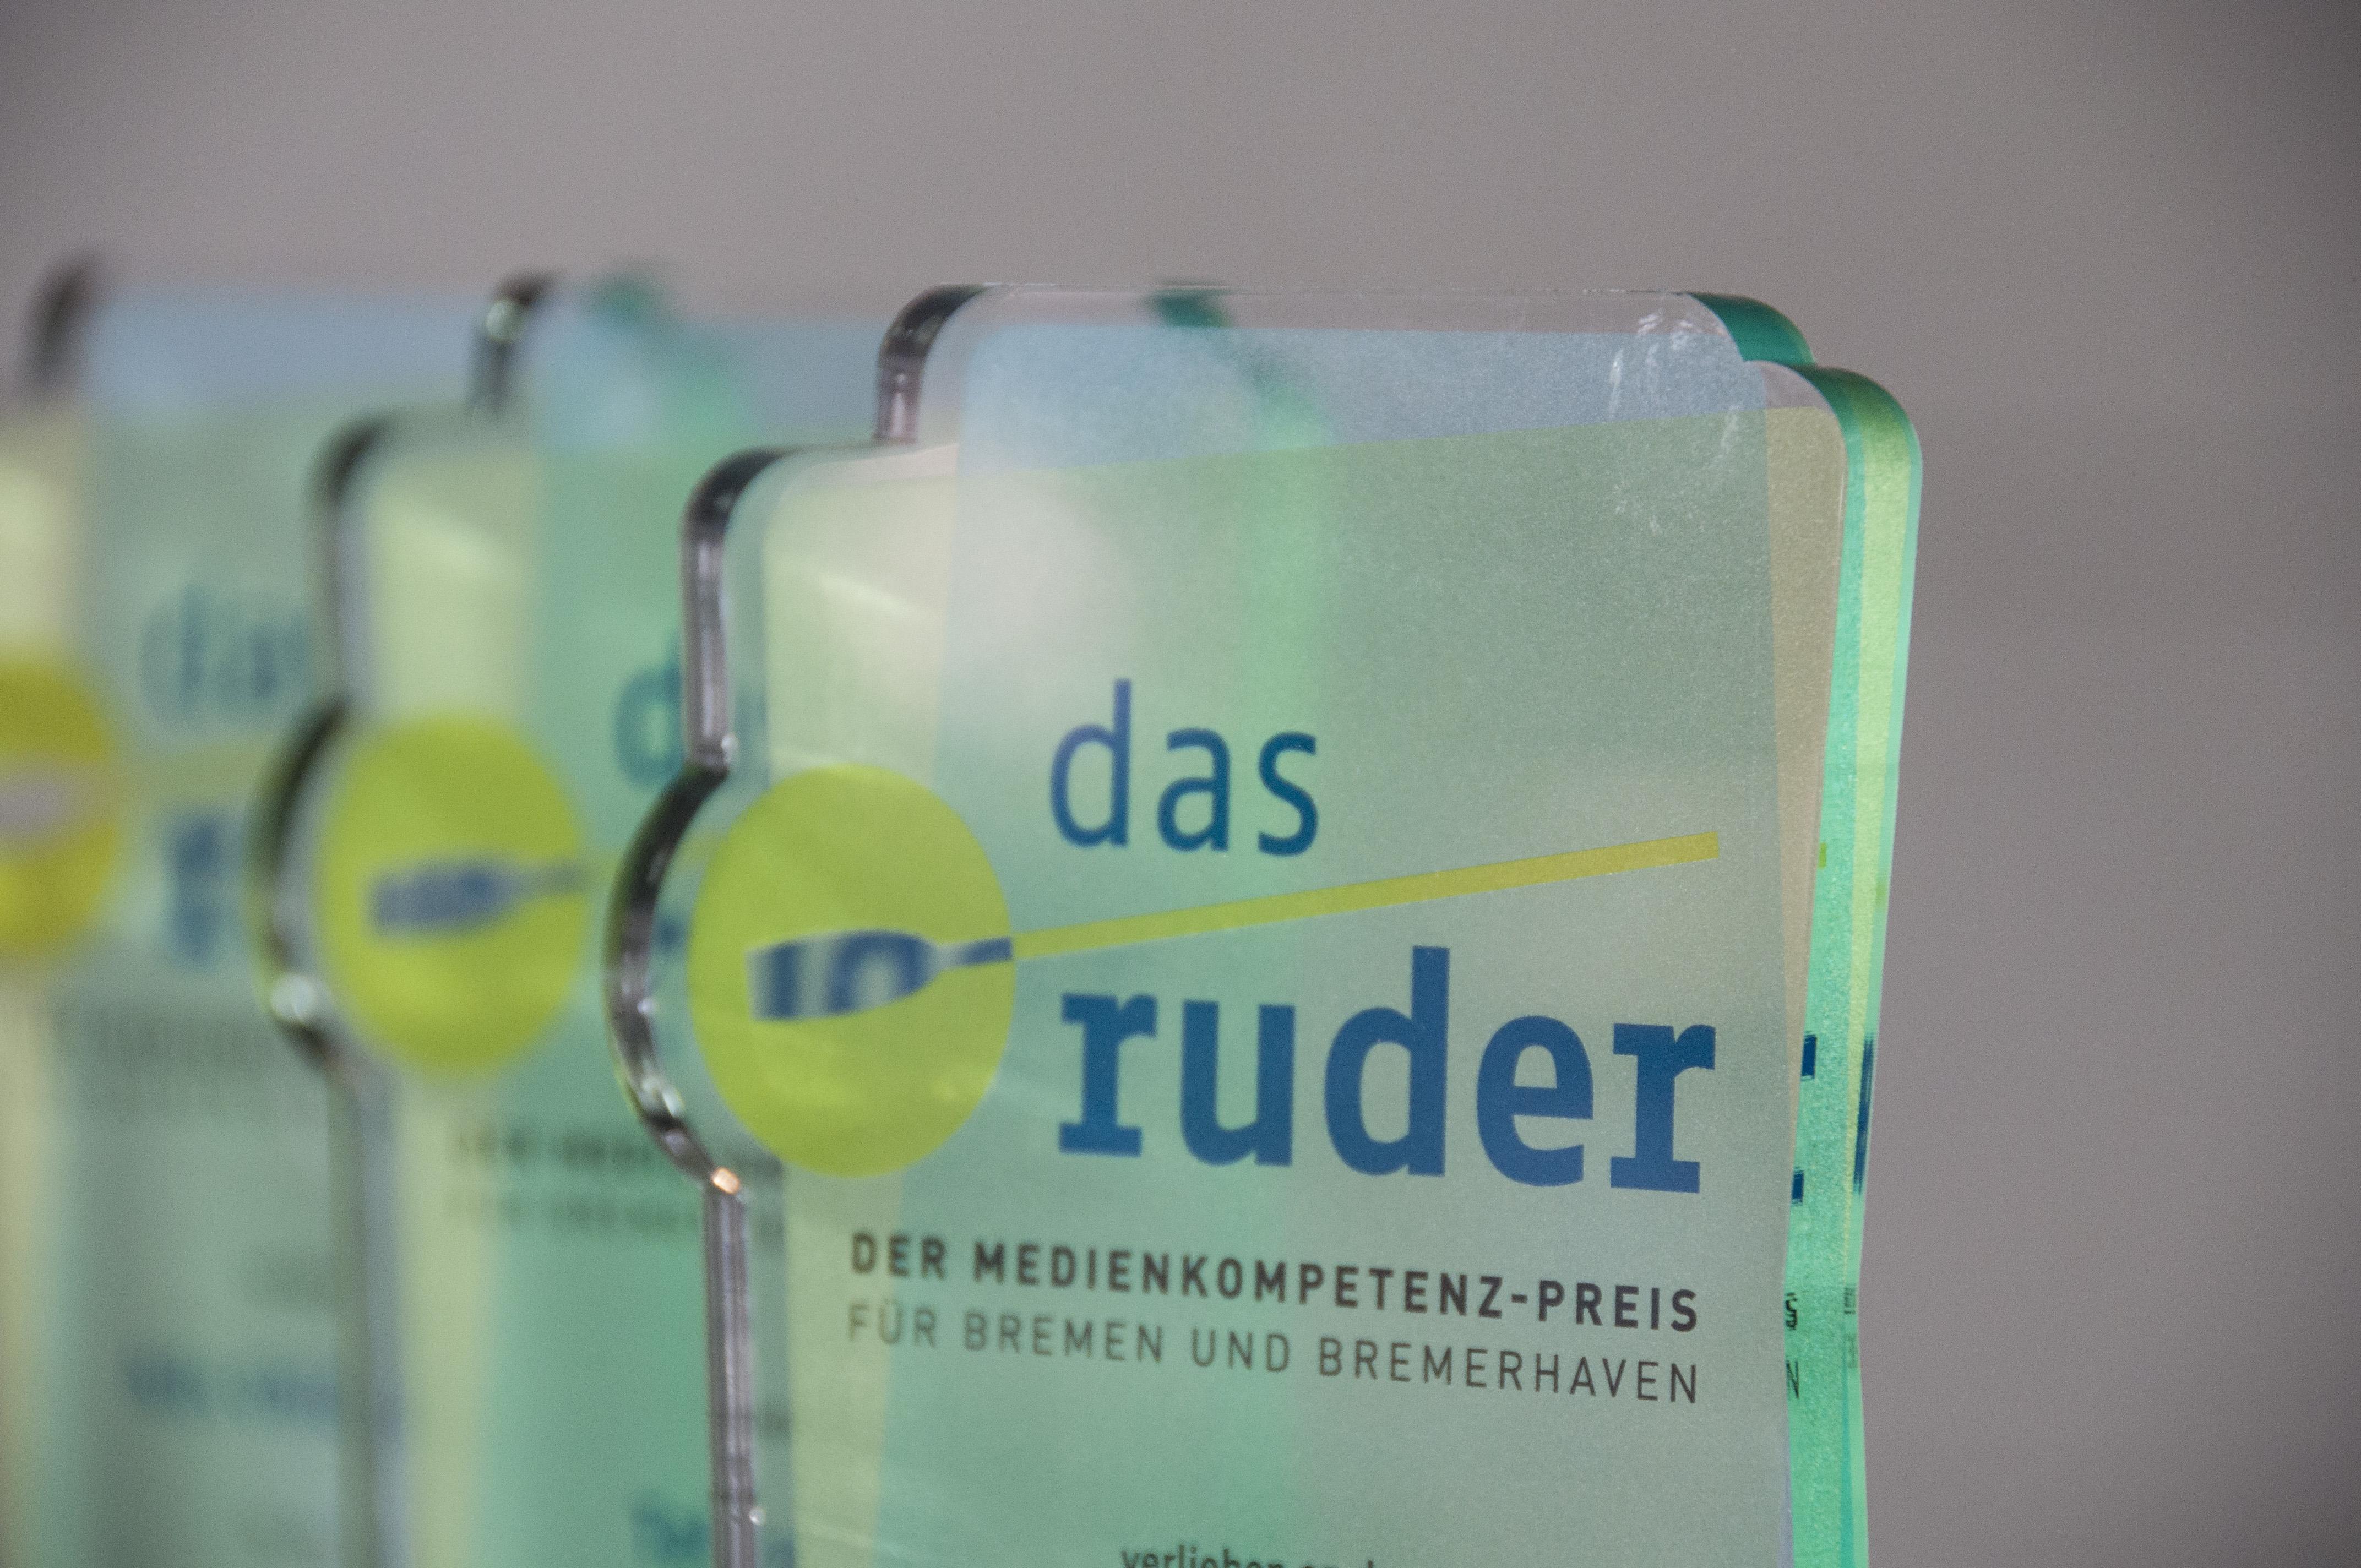 Bild des Ruder-Preises